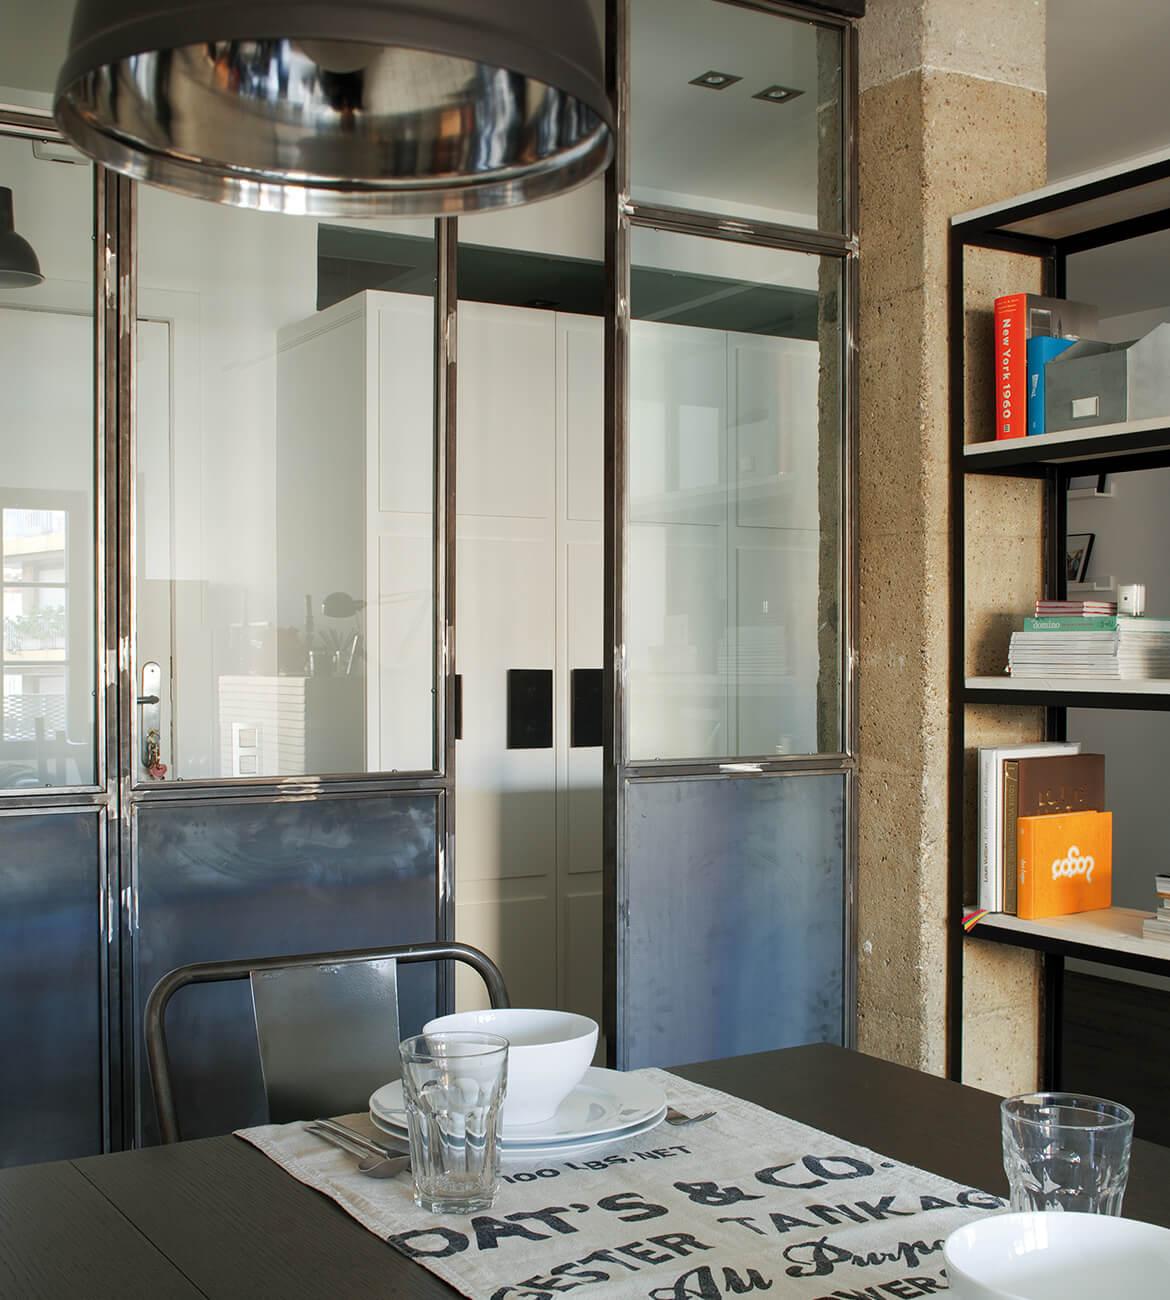 Catalina House interiorísmo casa Mitre. Apartamento estilo urbano